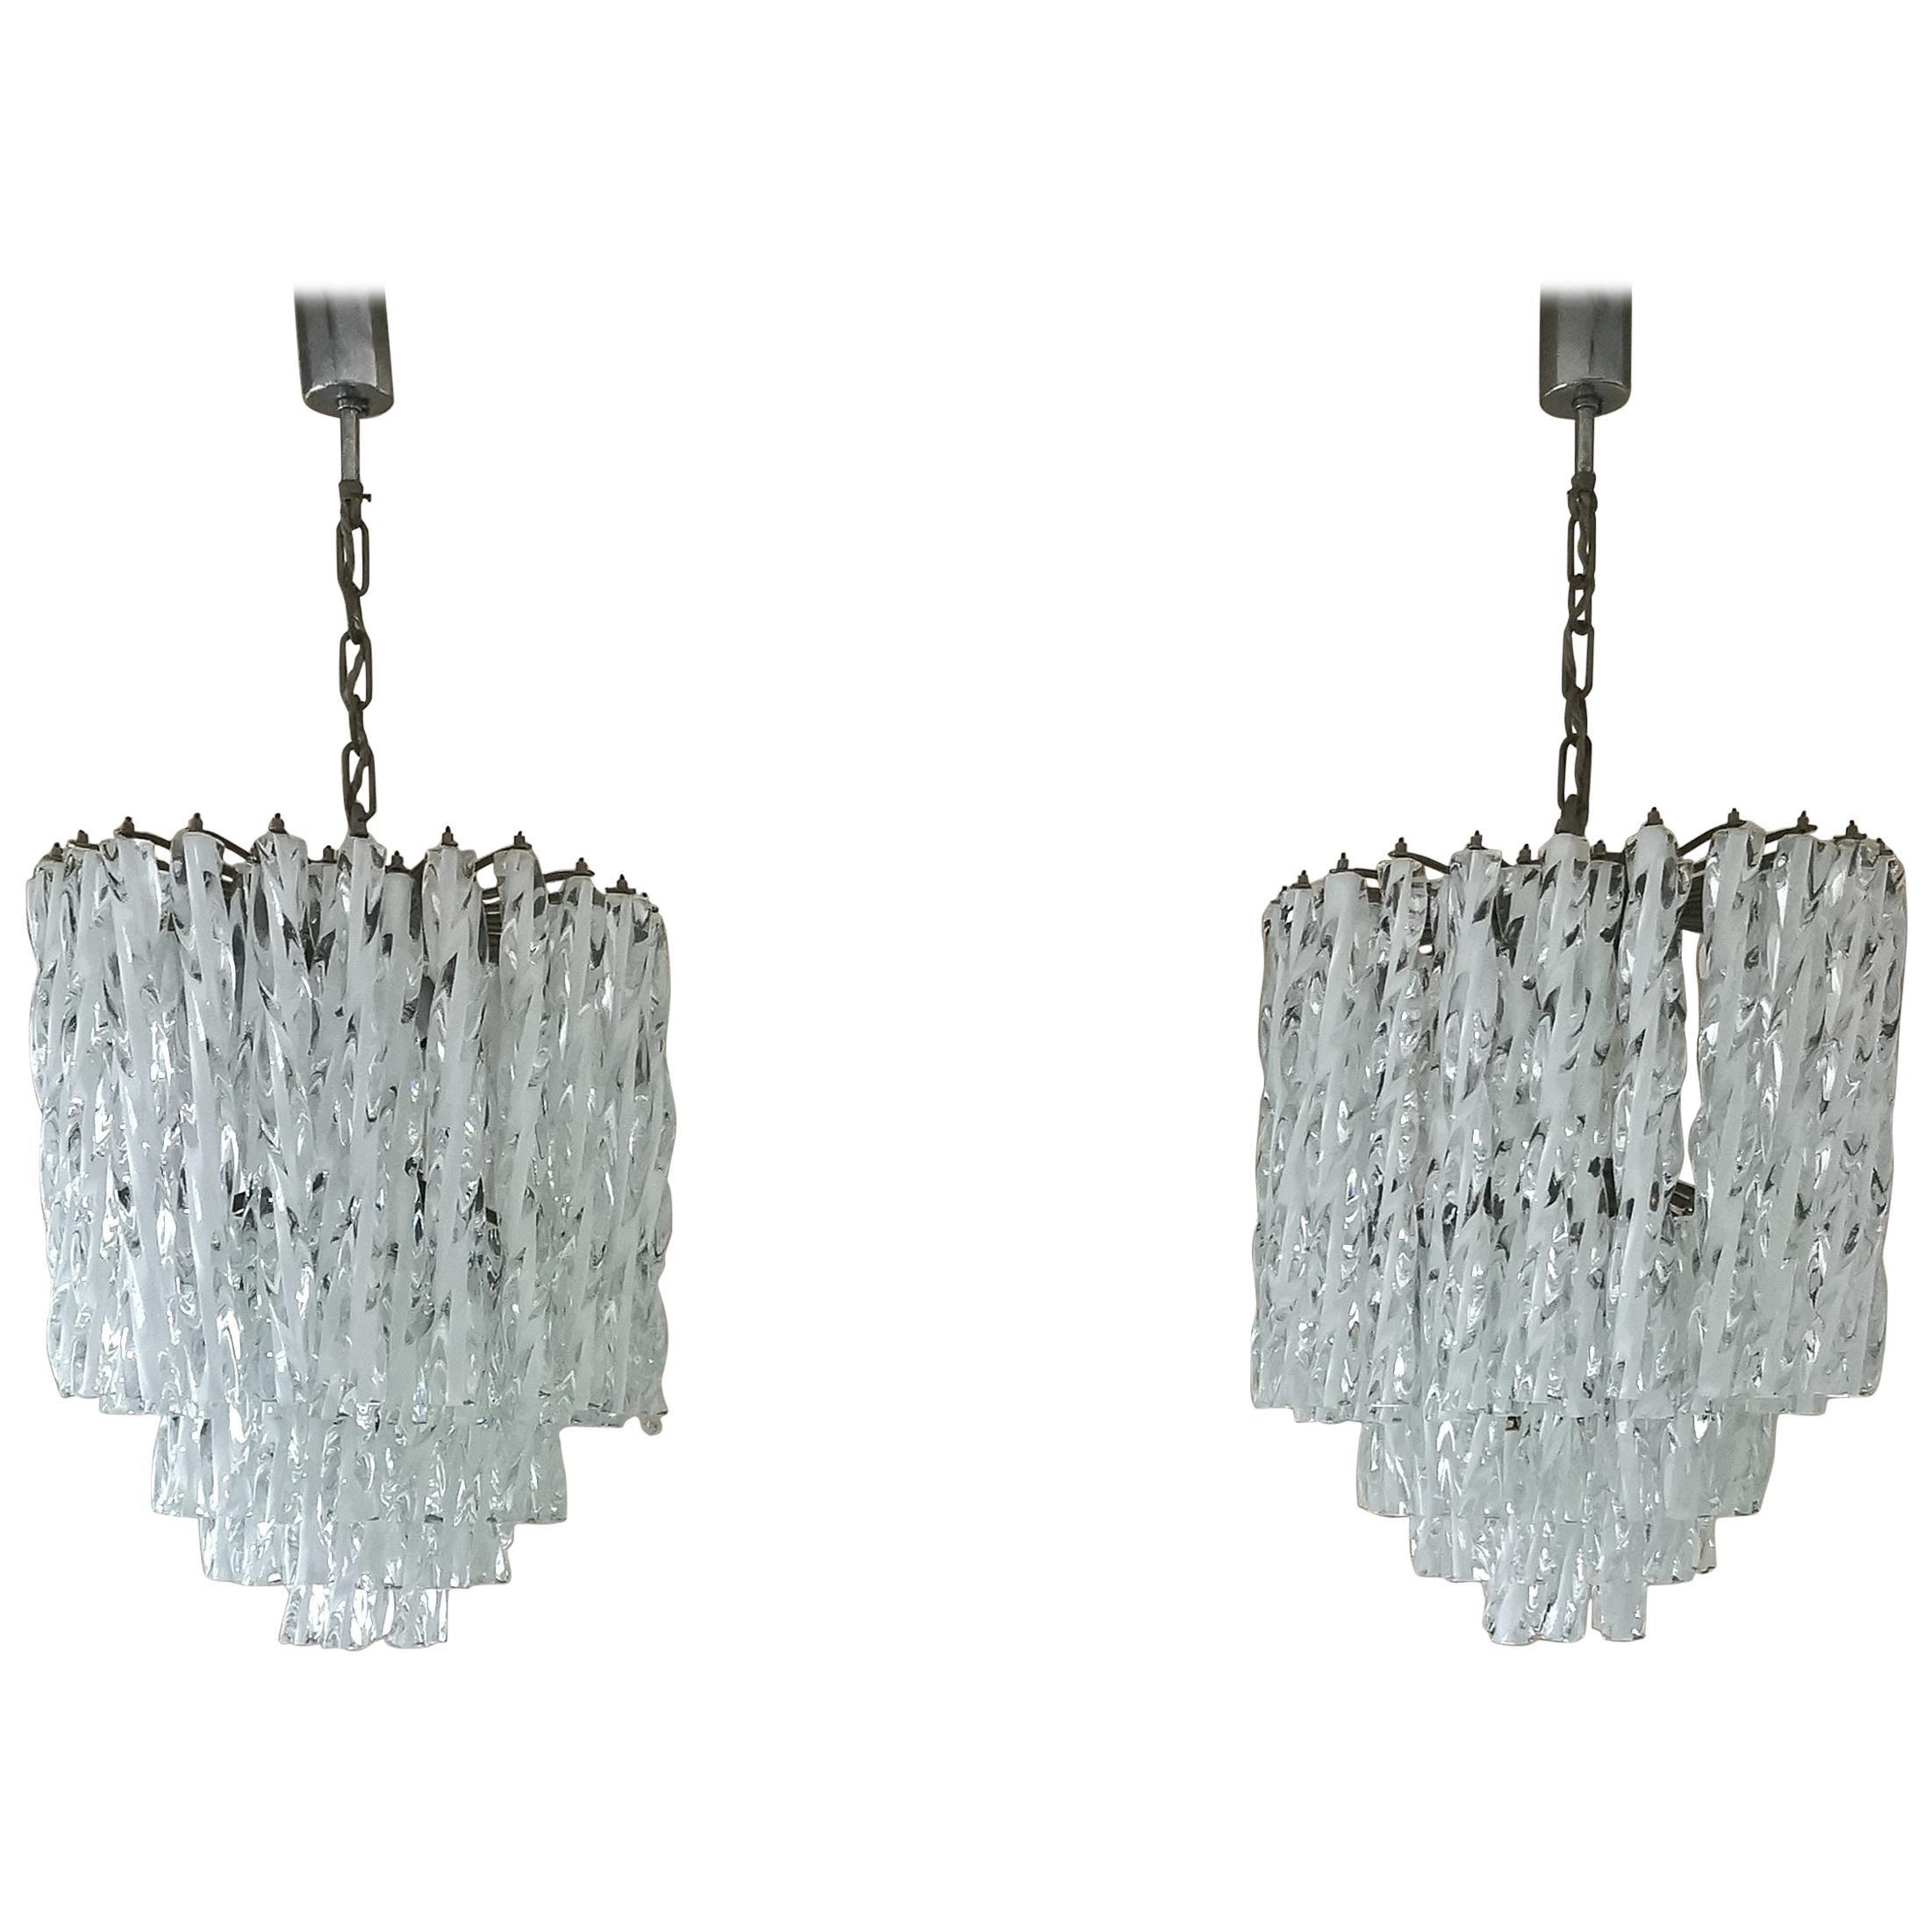 Chandeliers Murano Glass by Venini Midcentury Italian Design 1960s Set of 2